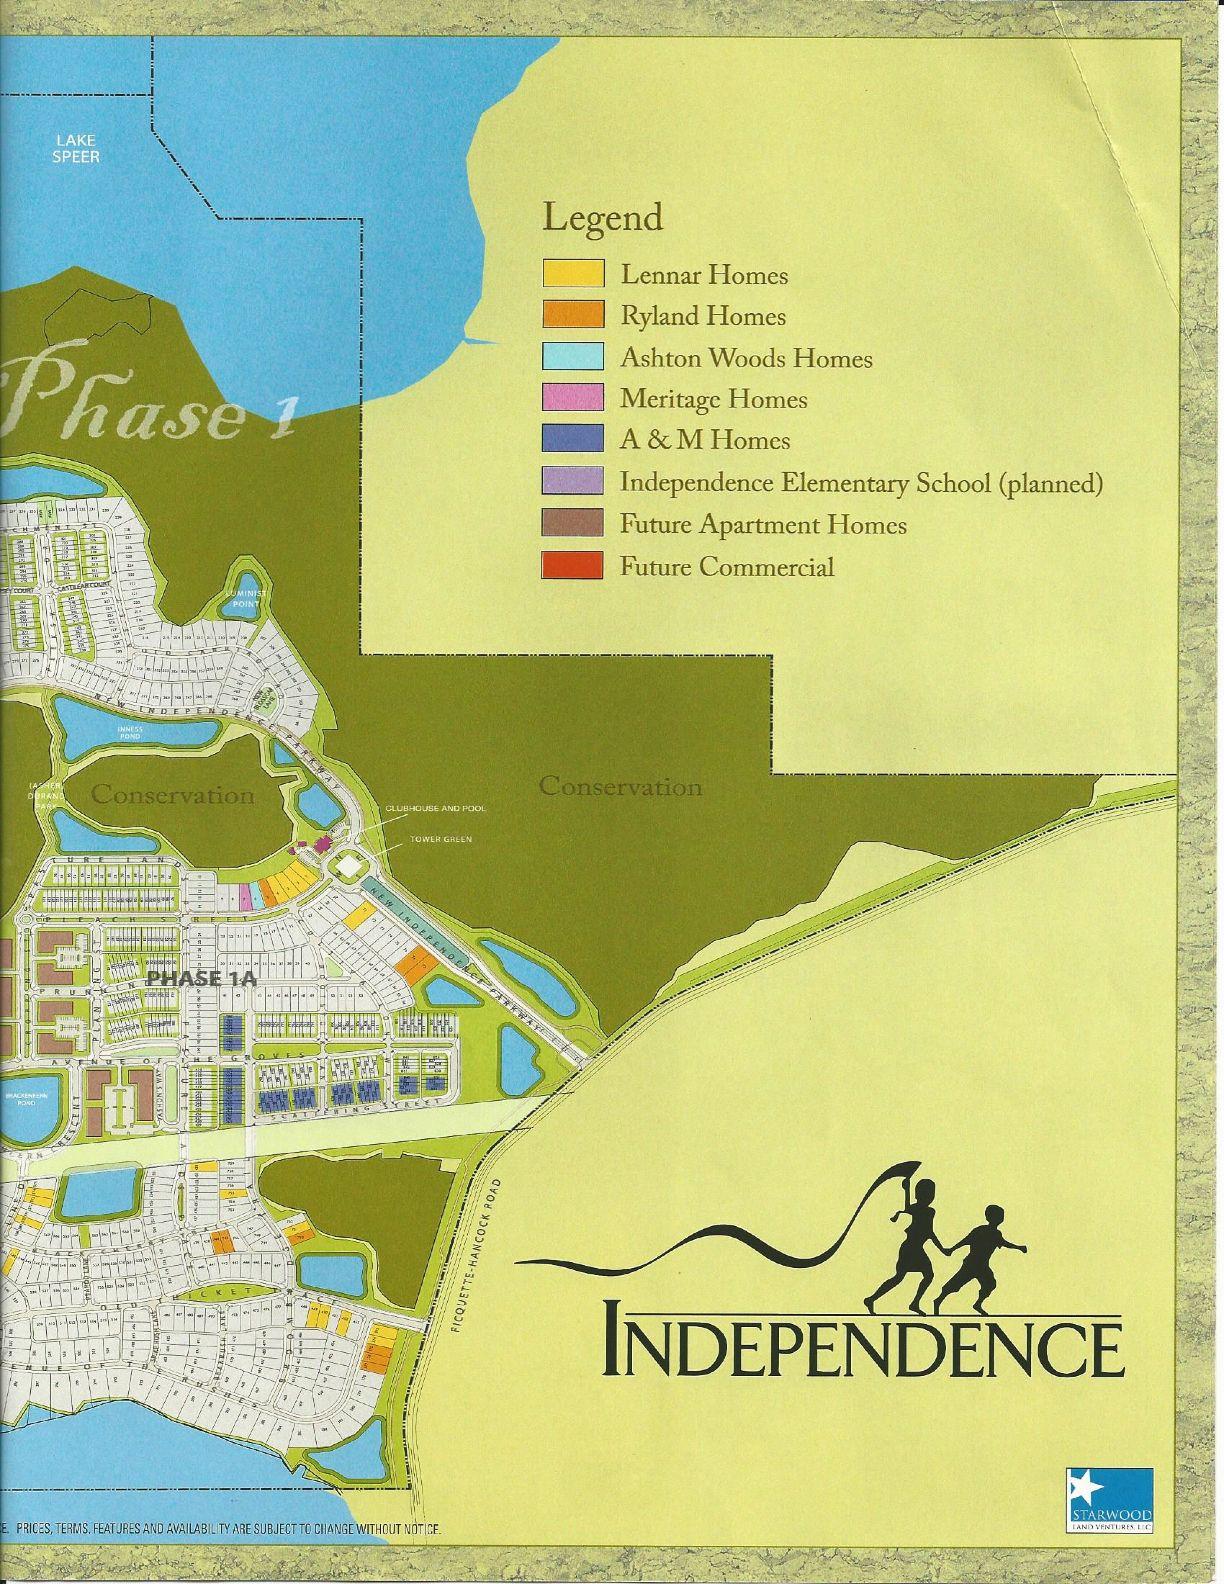 independence west side site plan in winter garden fl